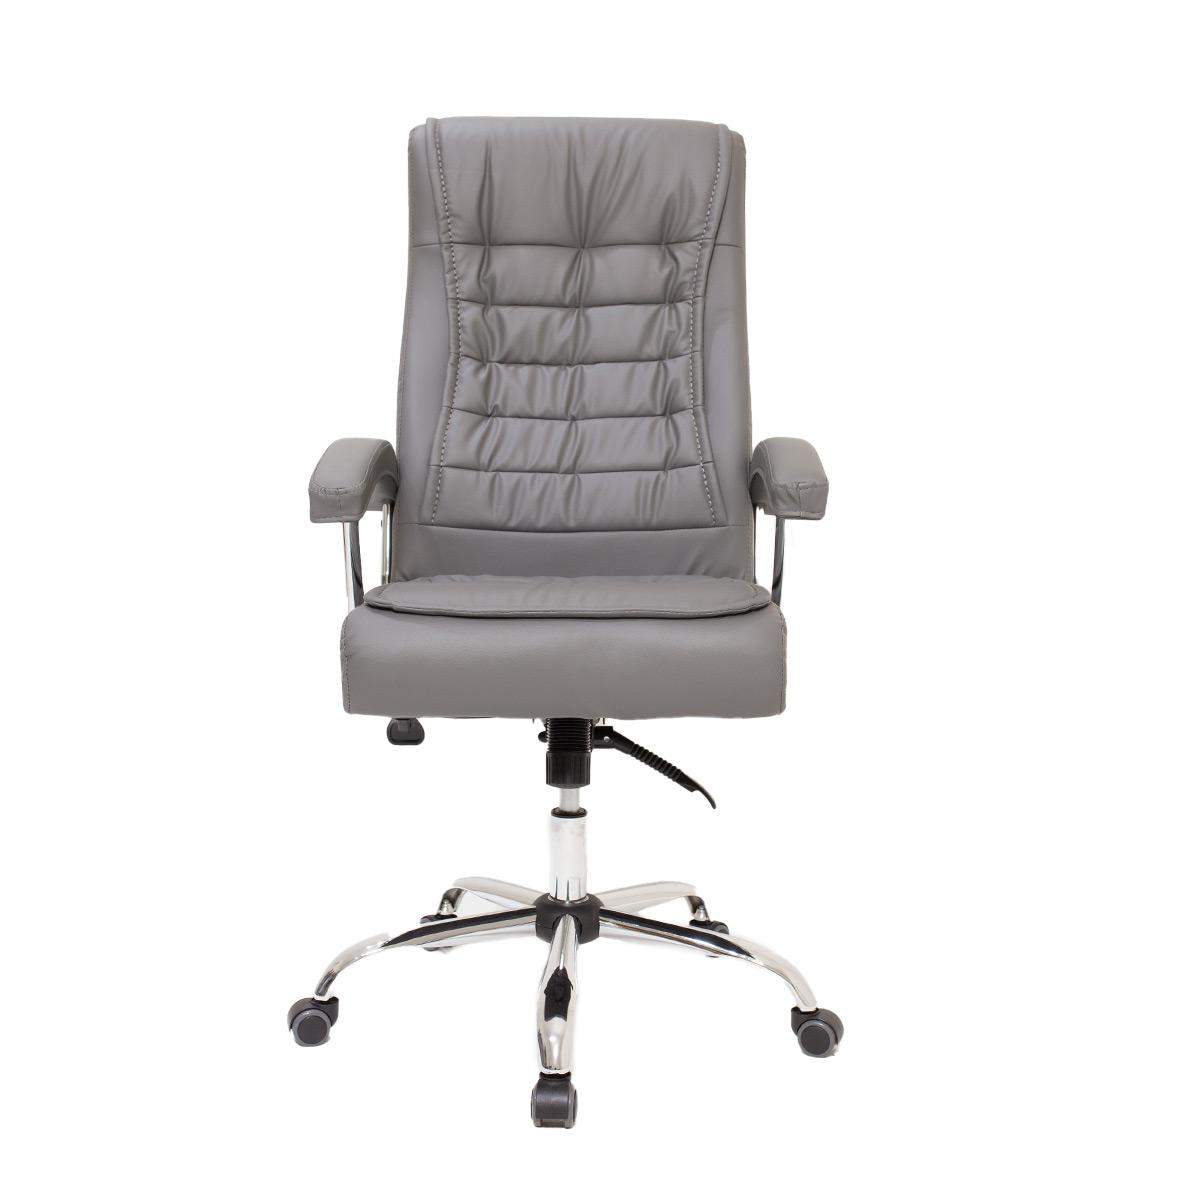 Kit 2 Cadeiras De Escritório Presidente Monique Big Cinza